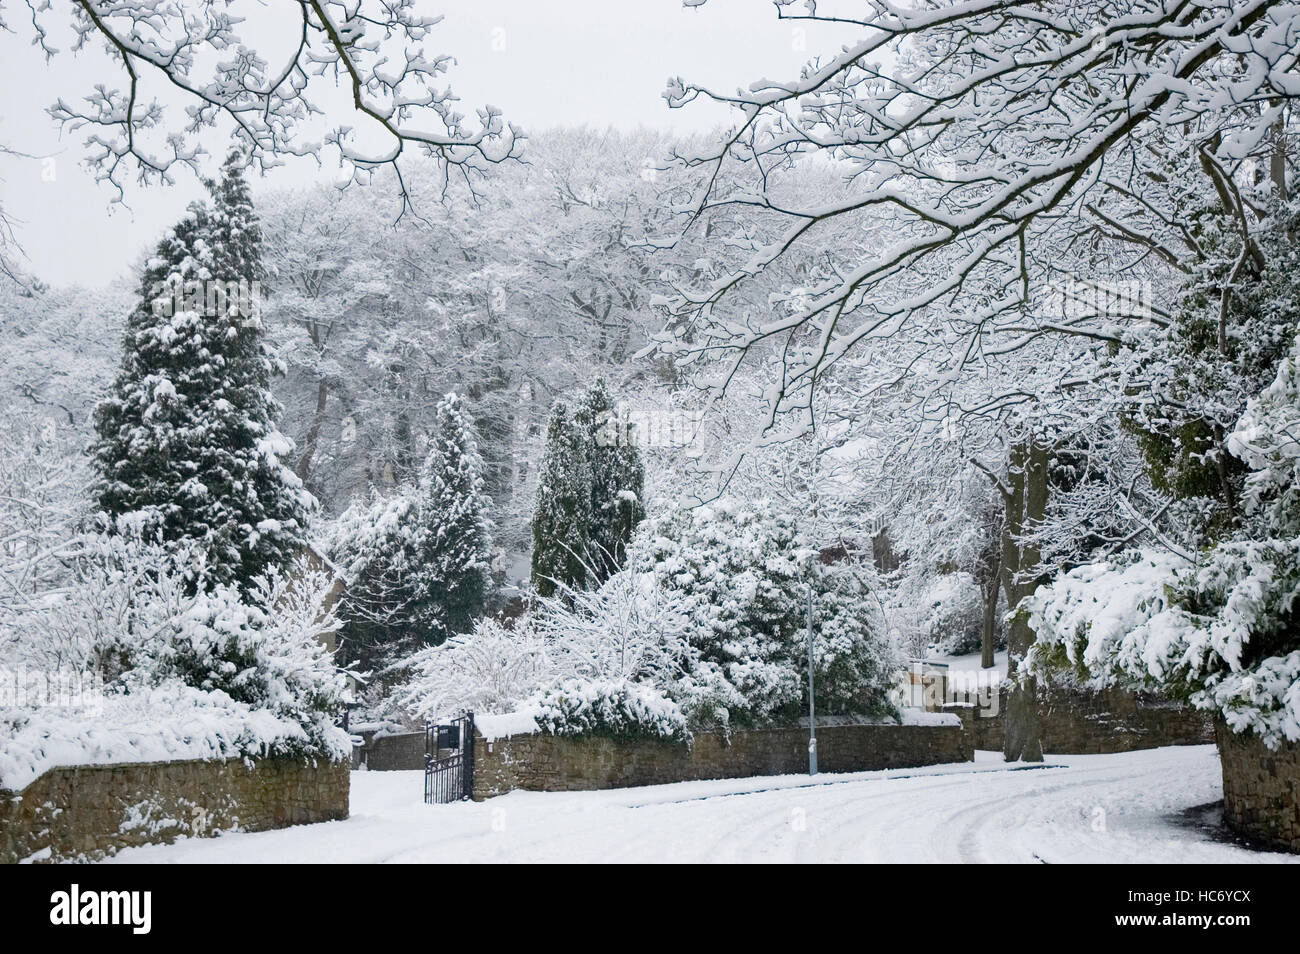 English Gardens and Lane covered in Snow Sheffield England UK United Kingdom - Stock Image